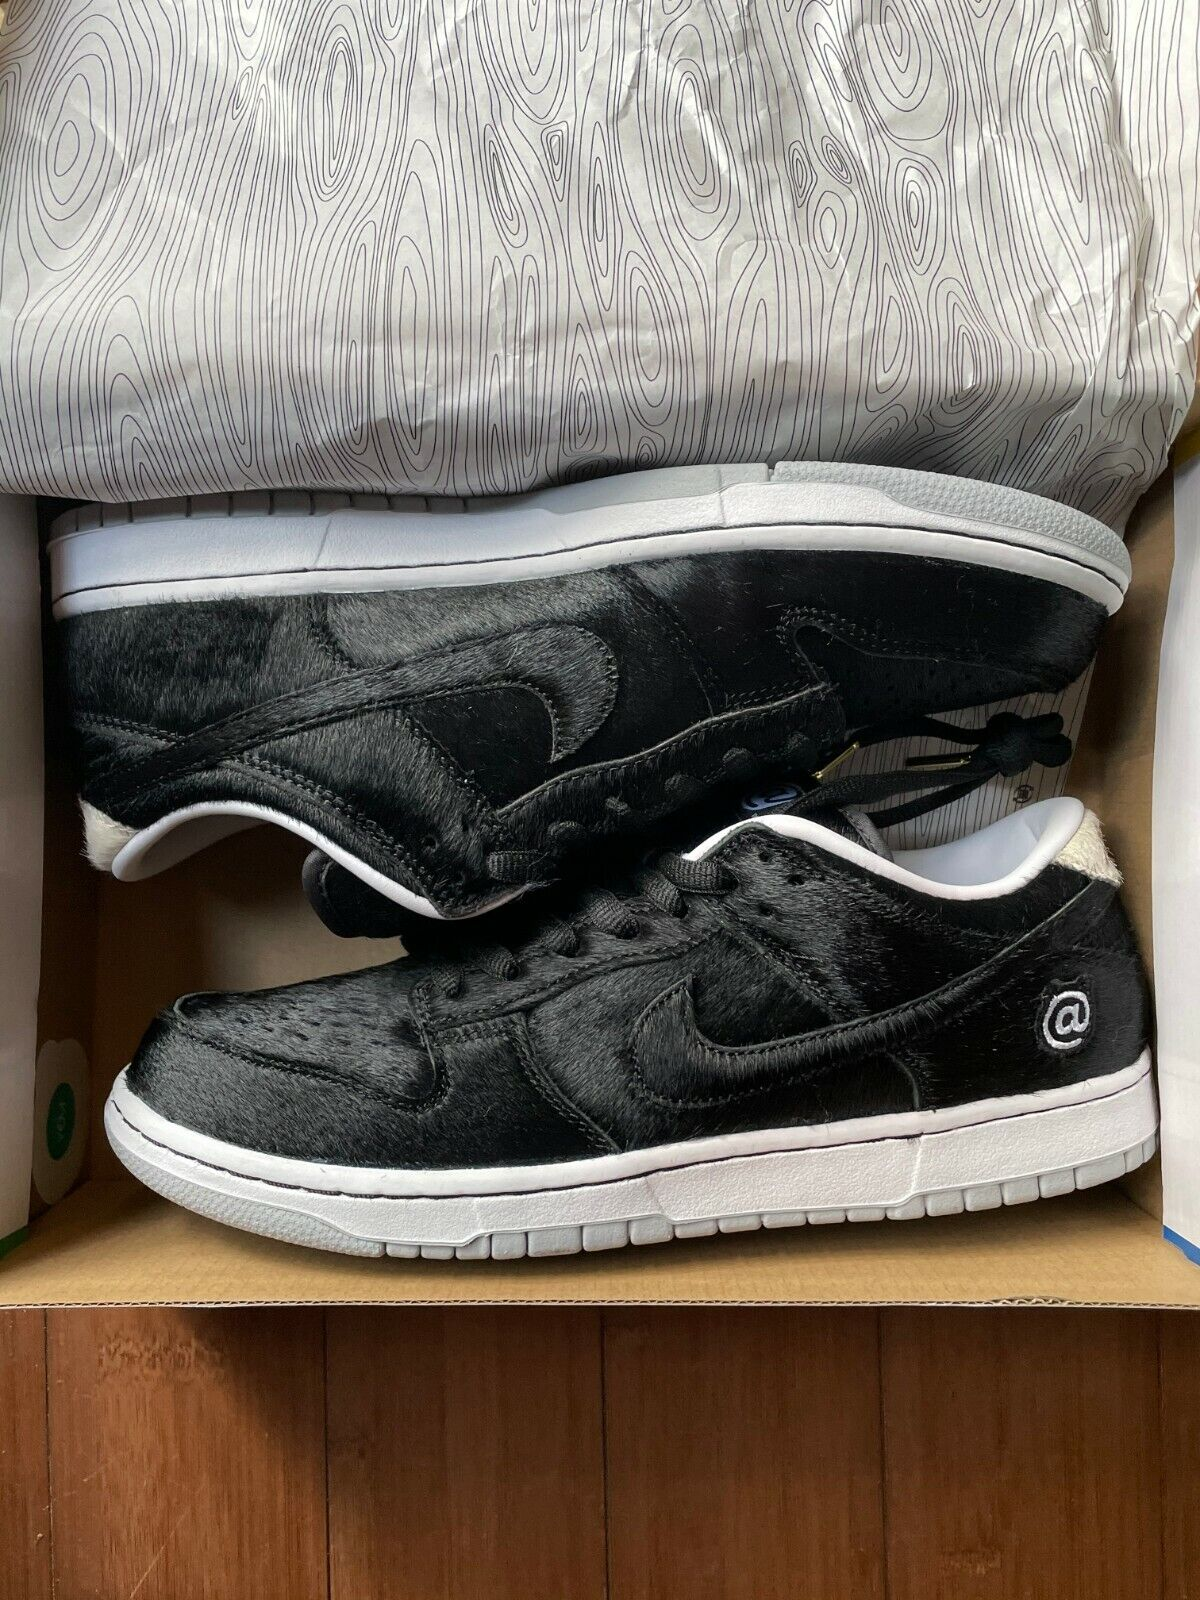 Medicom Toy x Nike SB Dunk Low [Deadstock] - Be@rbrick UK 10 / US 11 - NEW